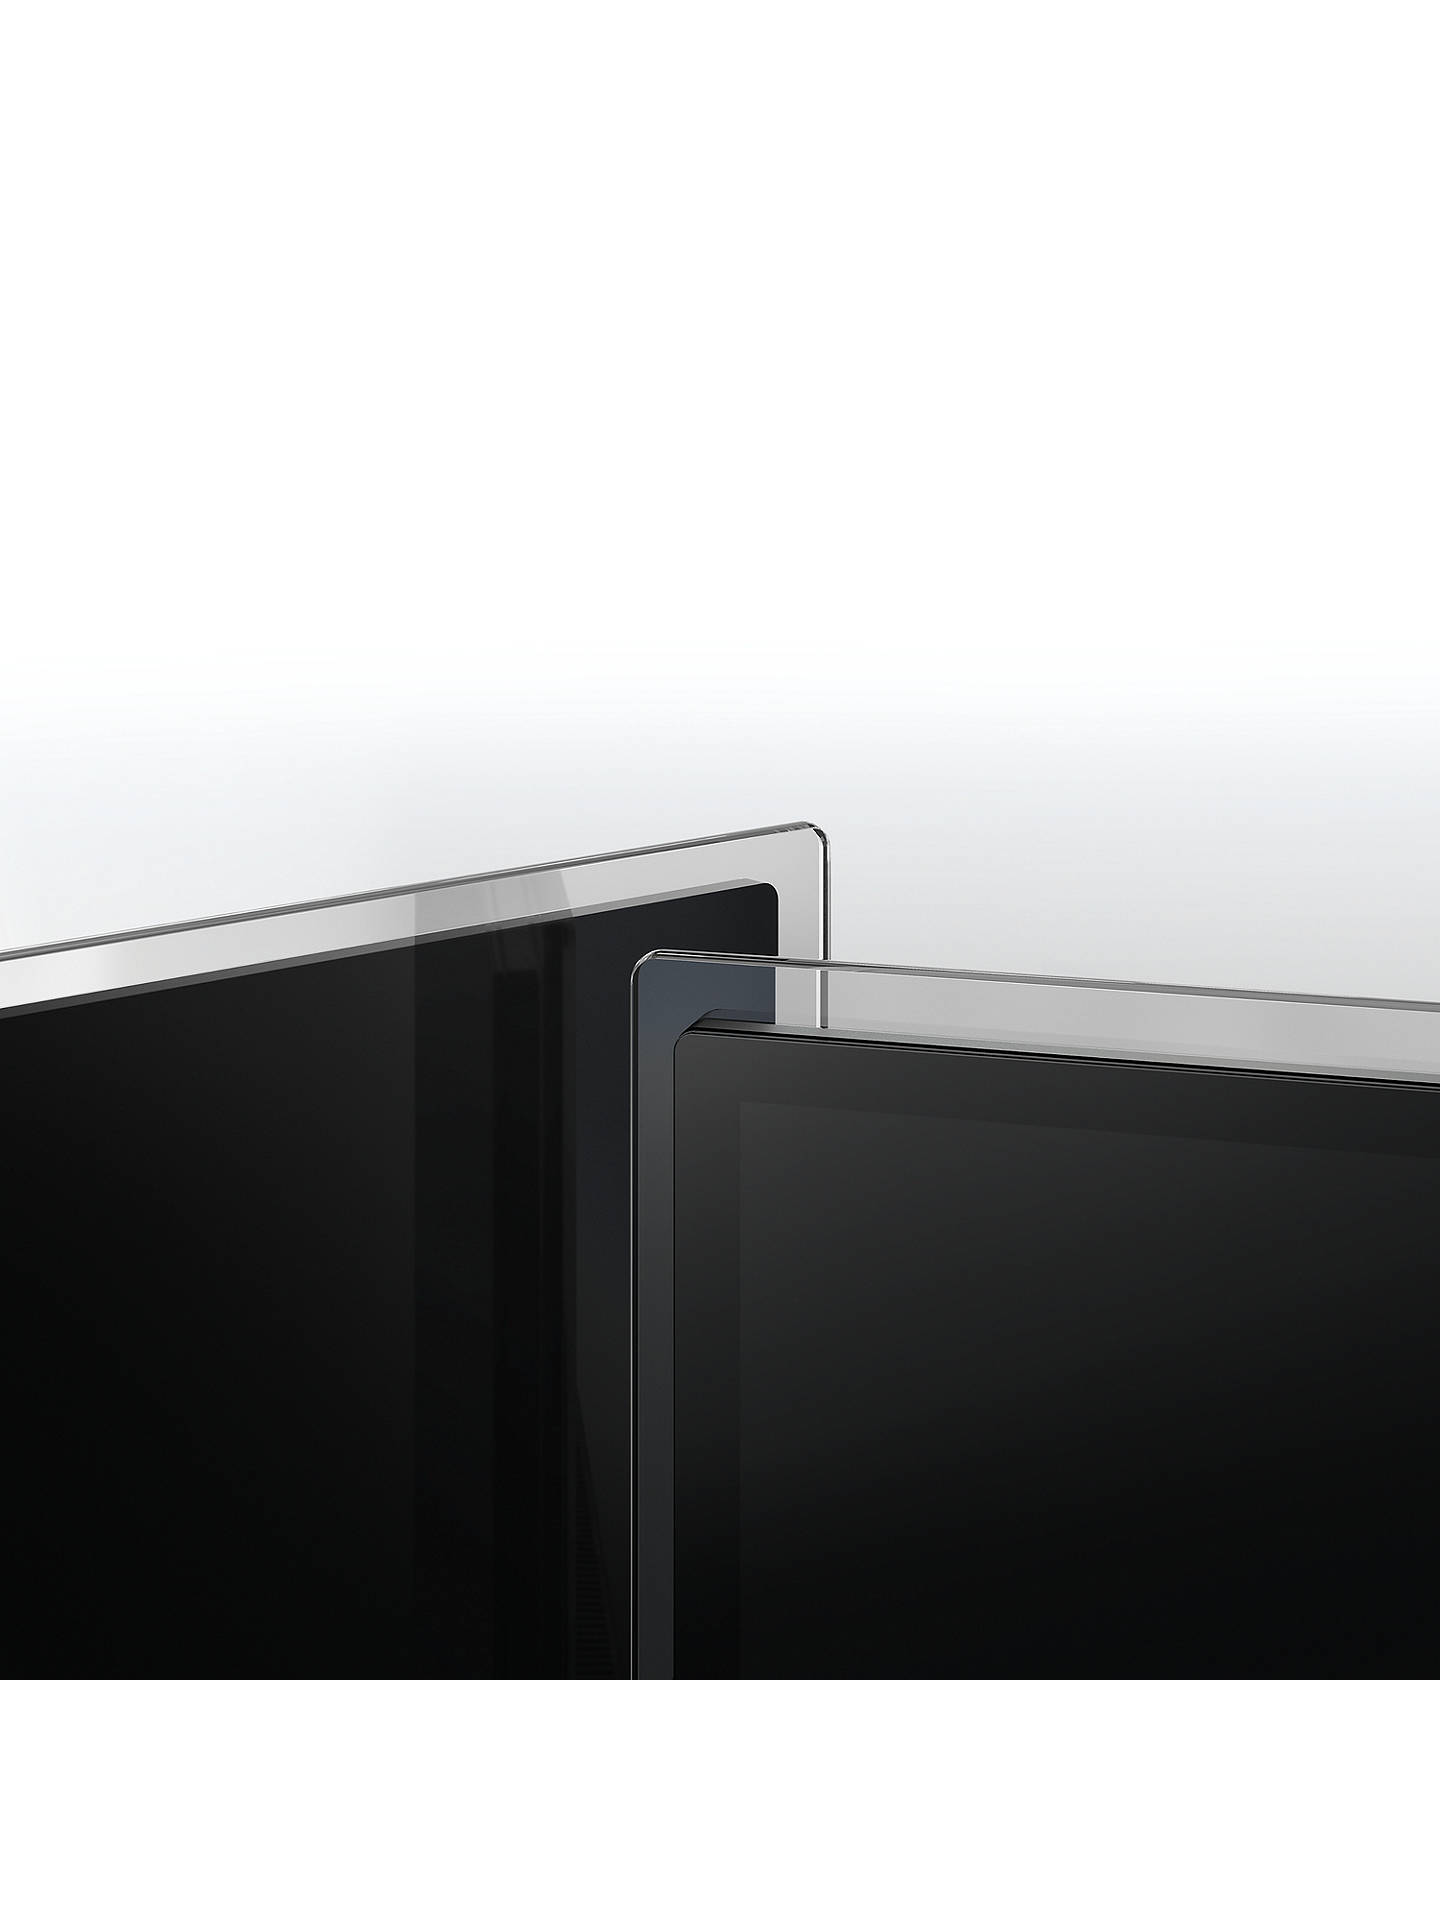 Panasonic TX-55FX750B LED HDR 4K Ultra HD Smart TV, 55